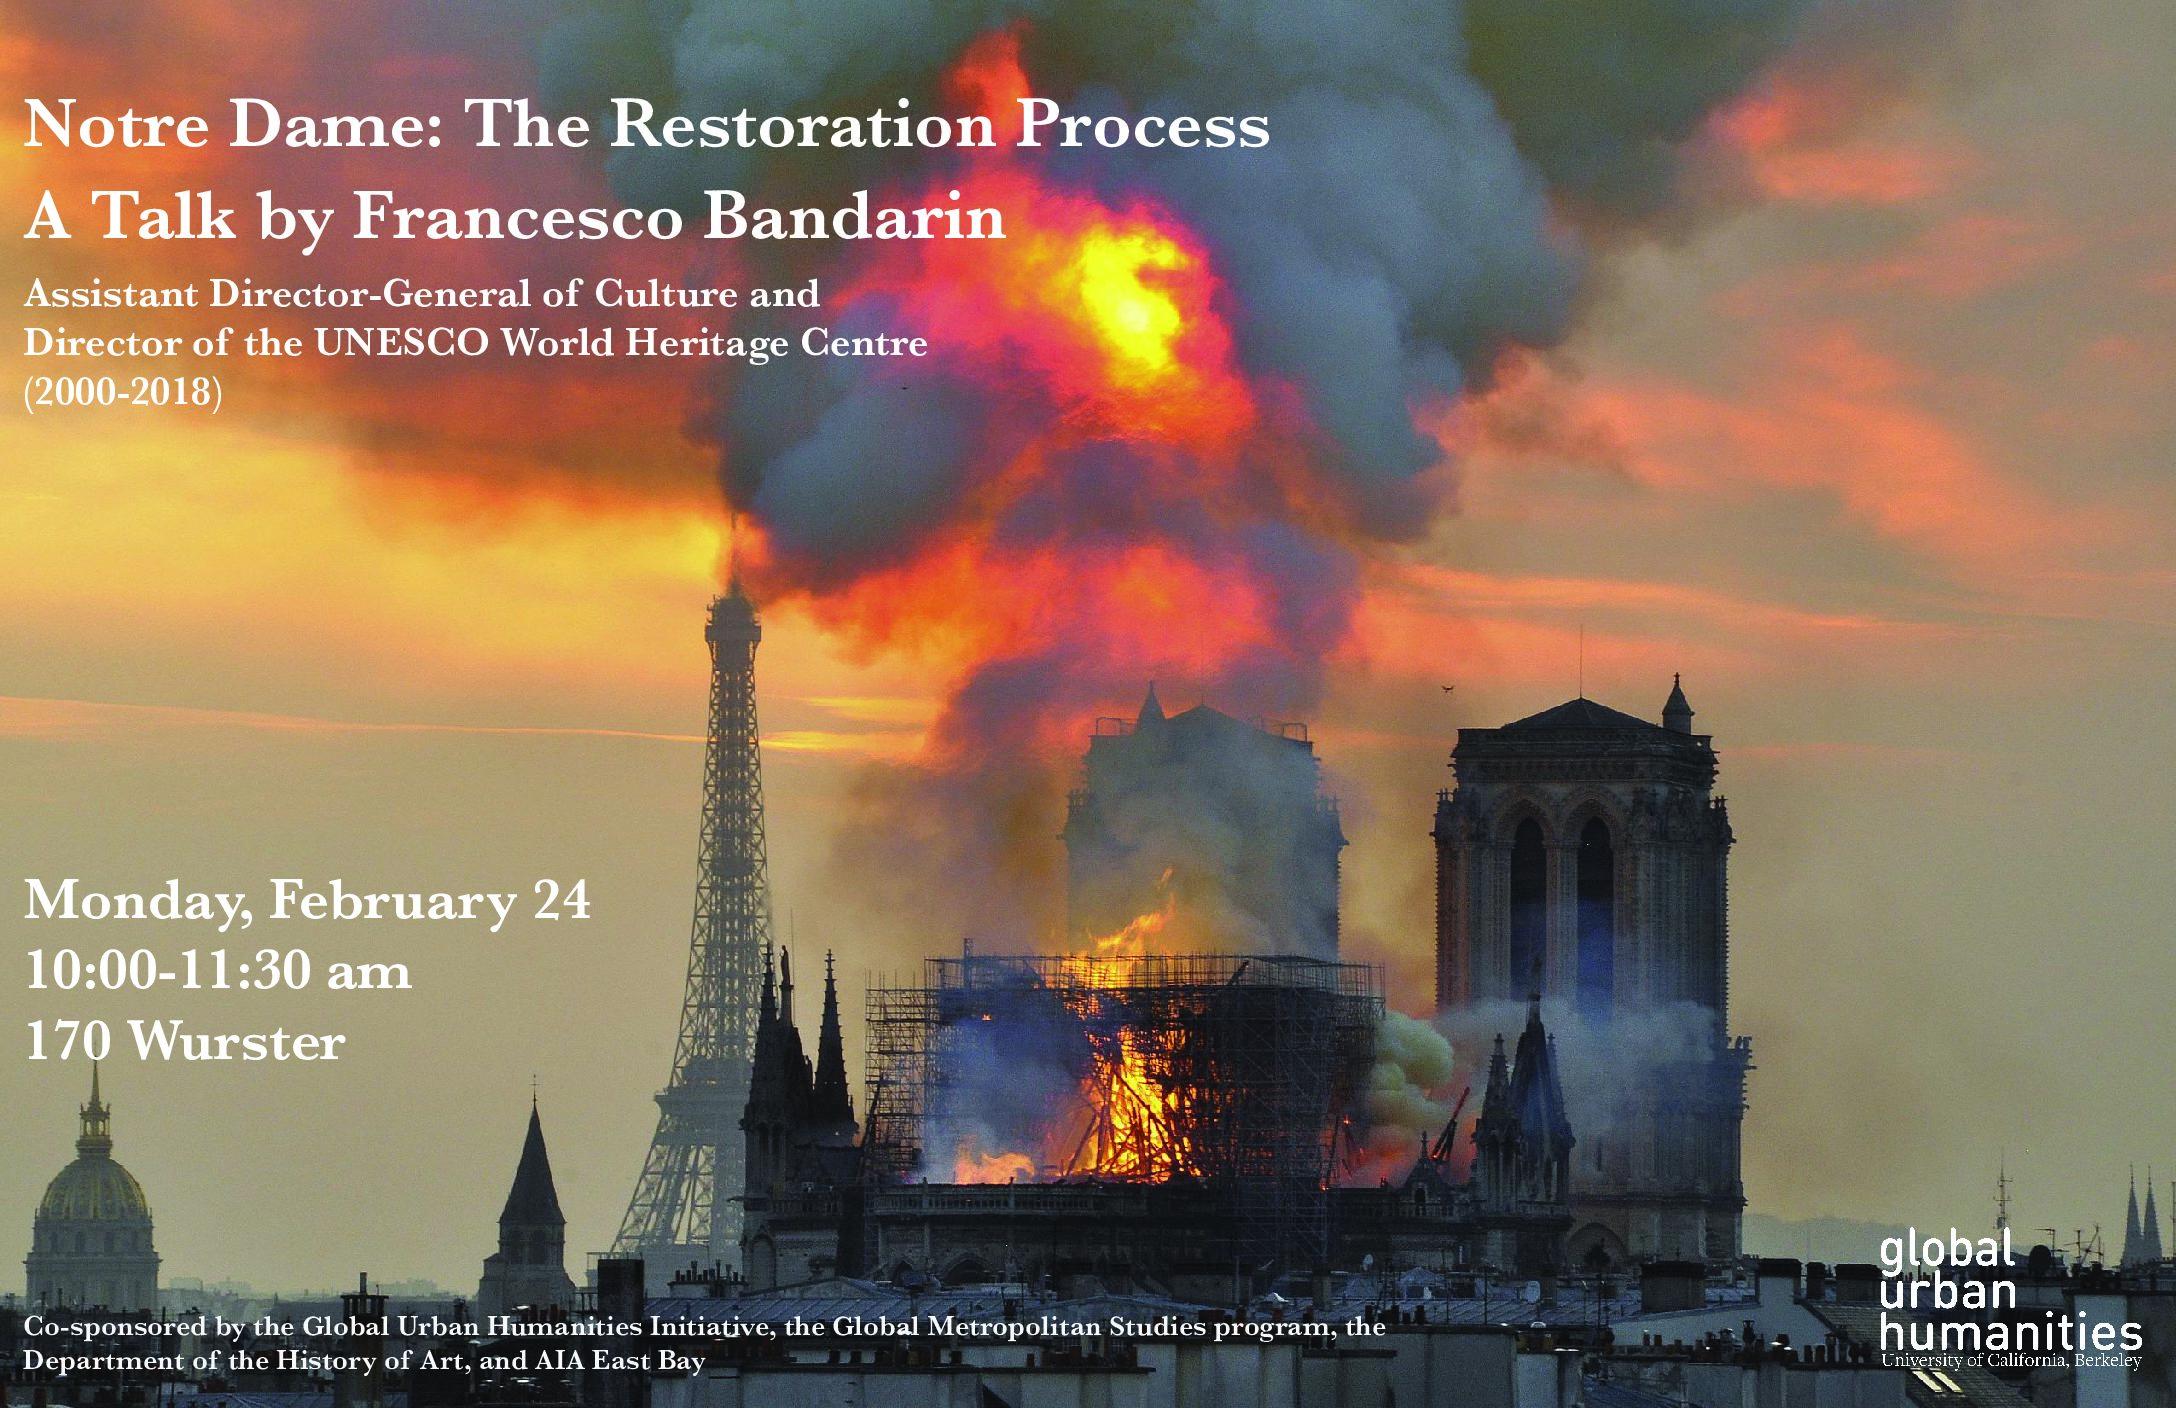 Notre Dame: The Restoration Process a Talk by Francesco Bandarin